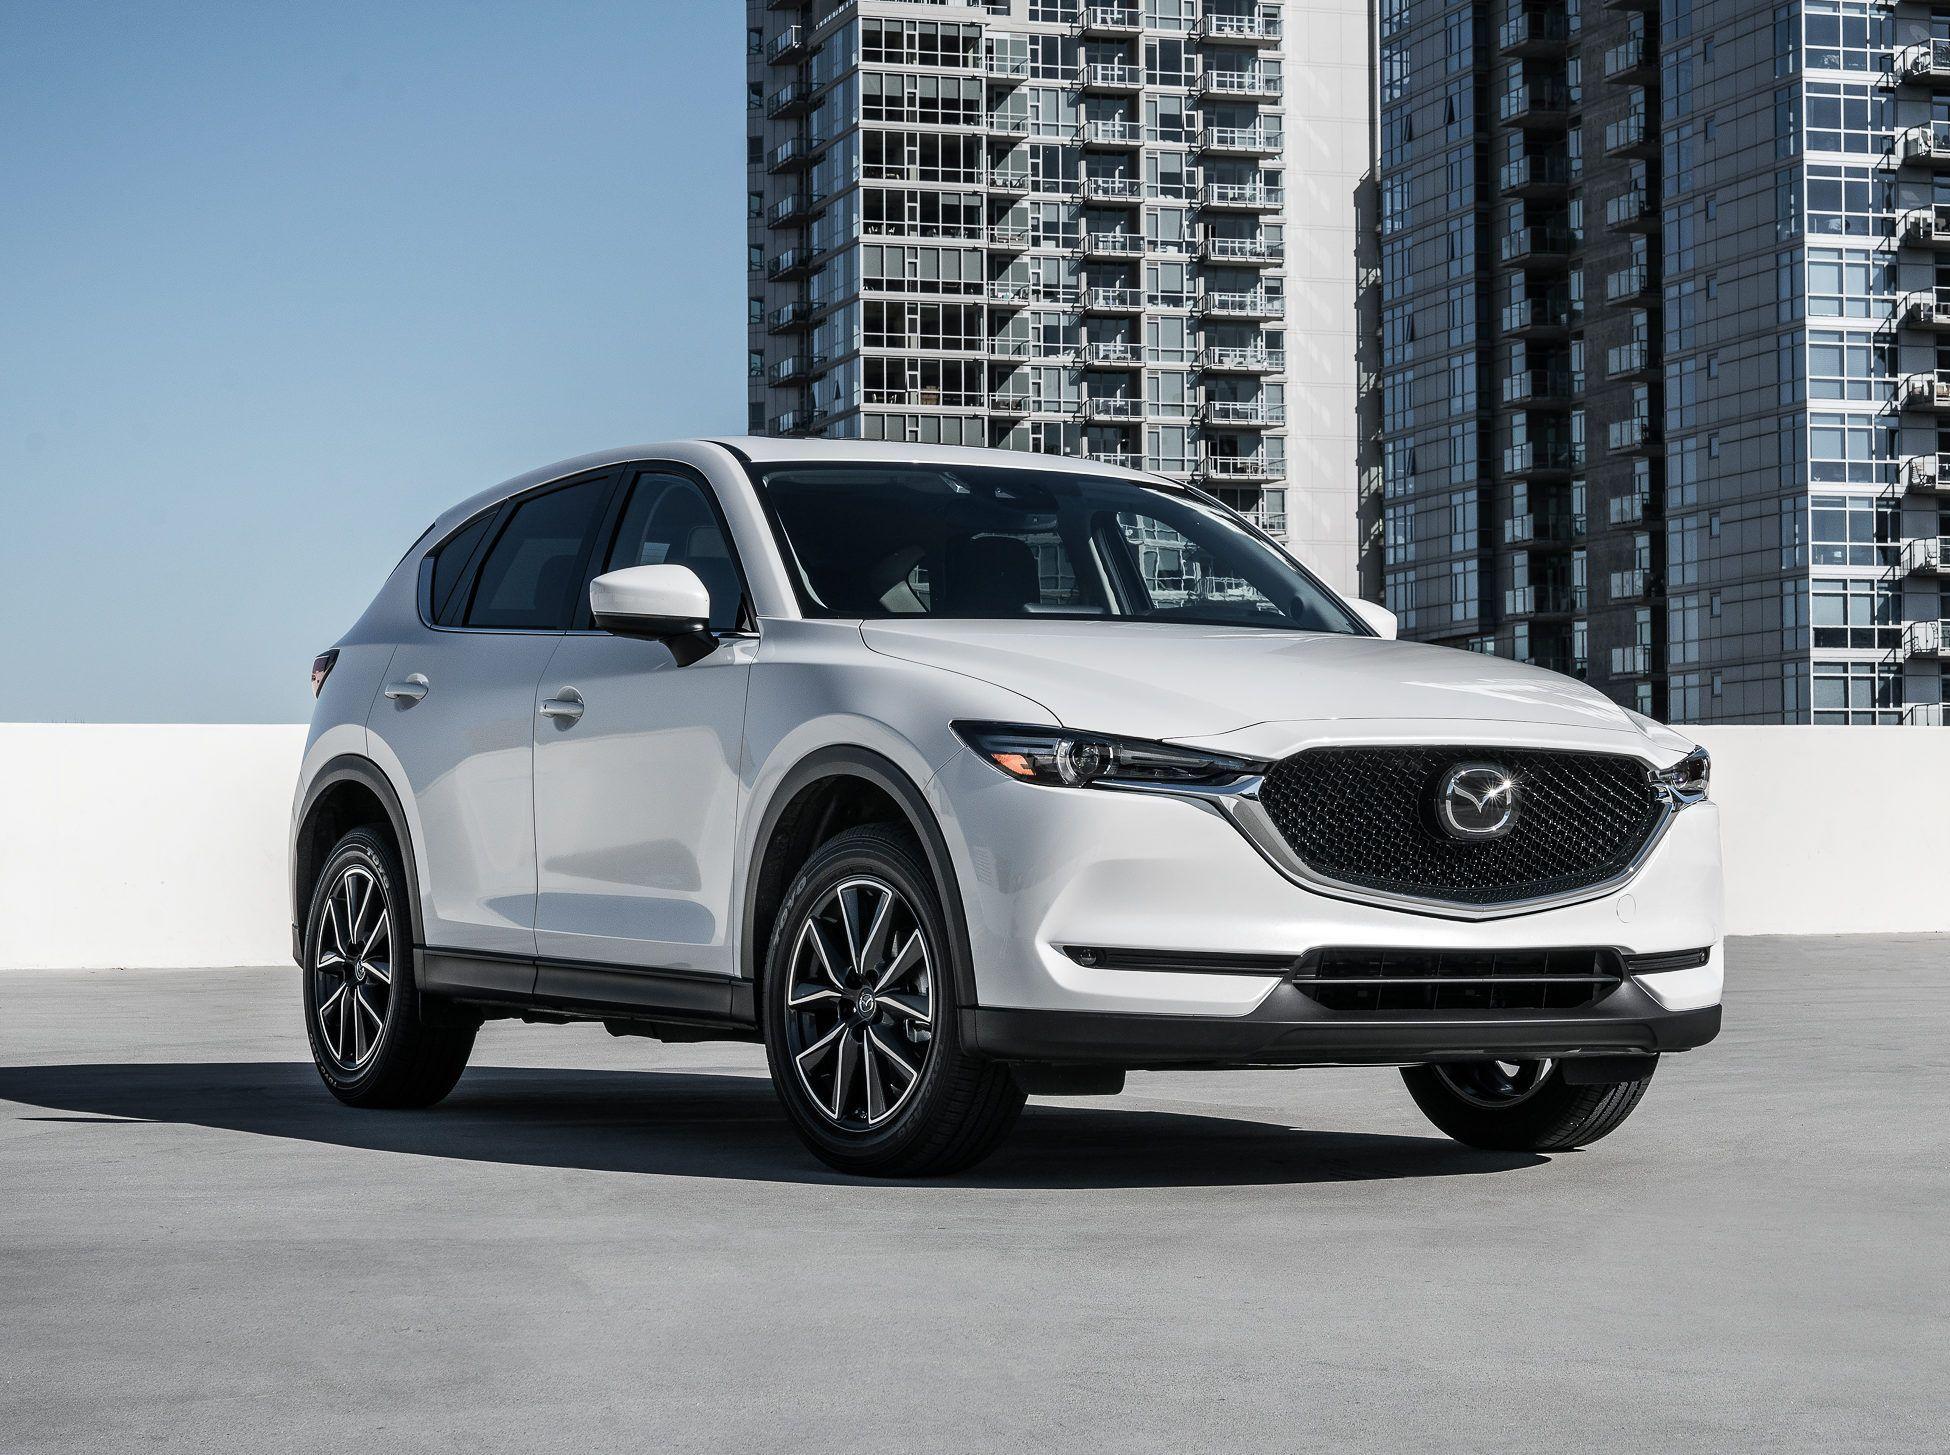 Mazda Updates Bulletin Warning Against Painting Ground Point On Fender Stays R In 2020 Mazda Rennsport Maserati